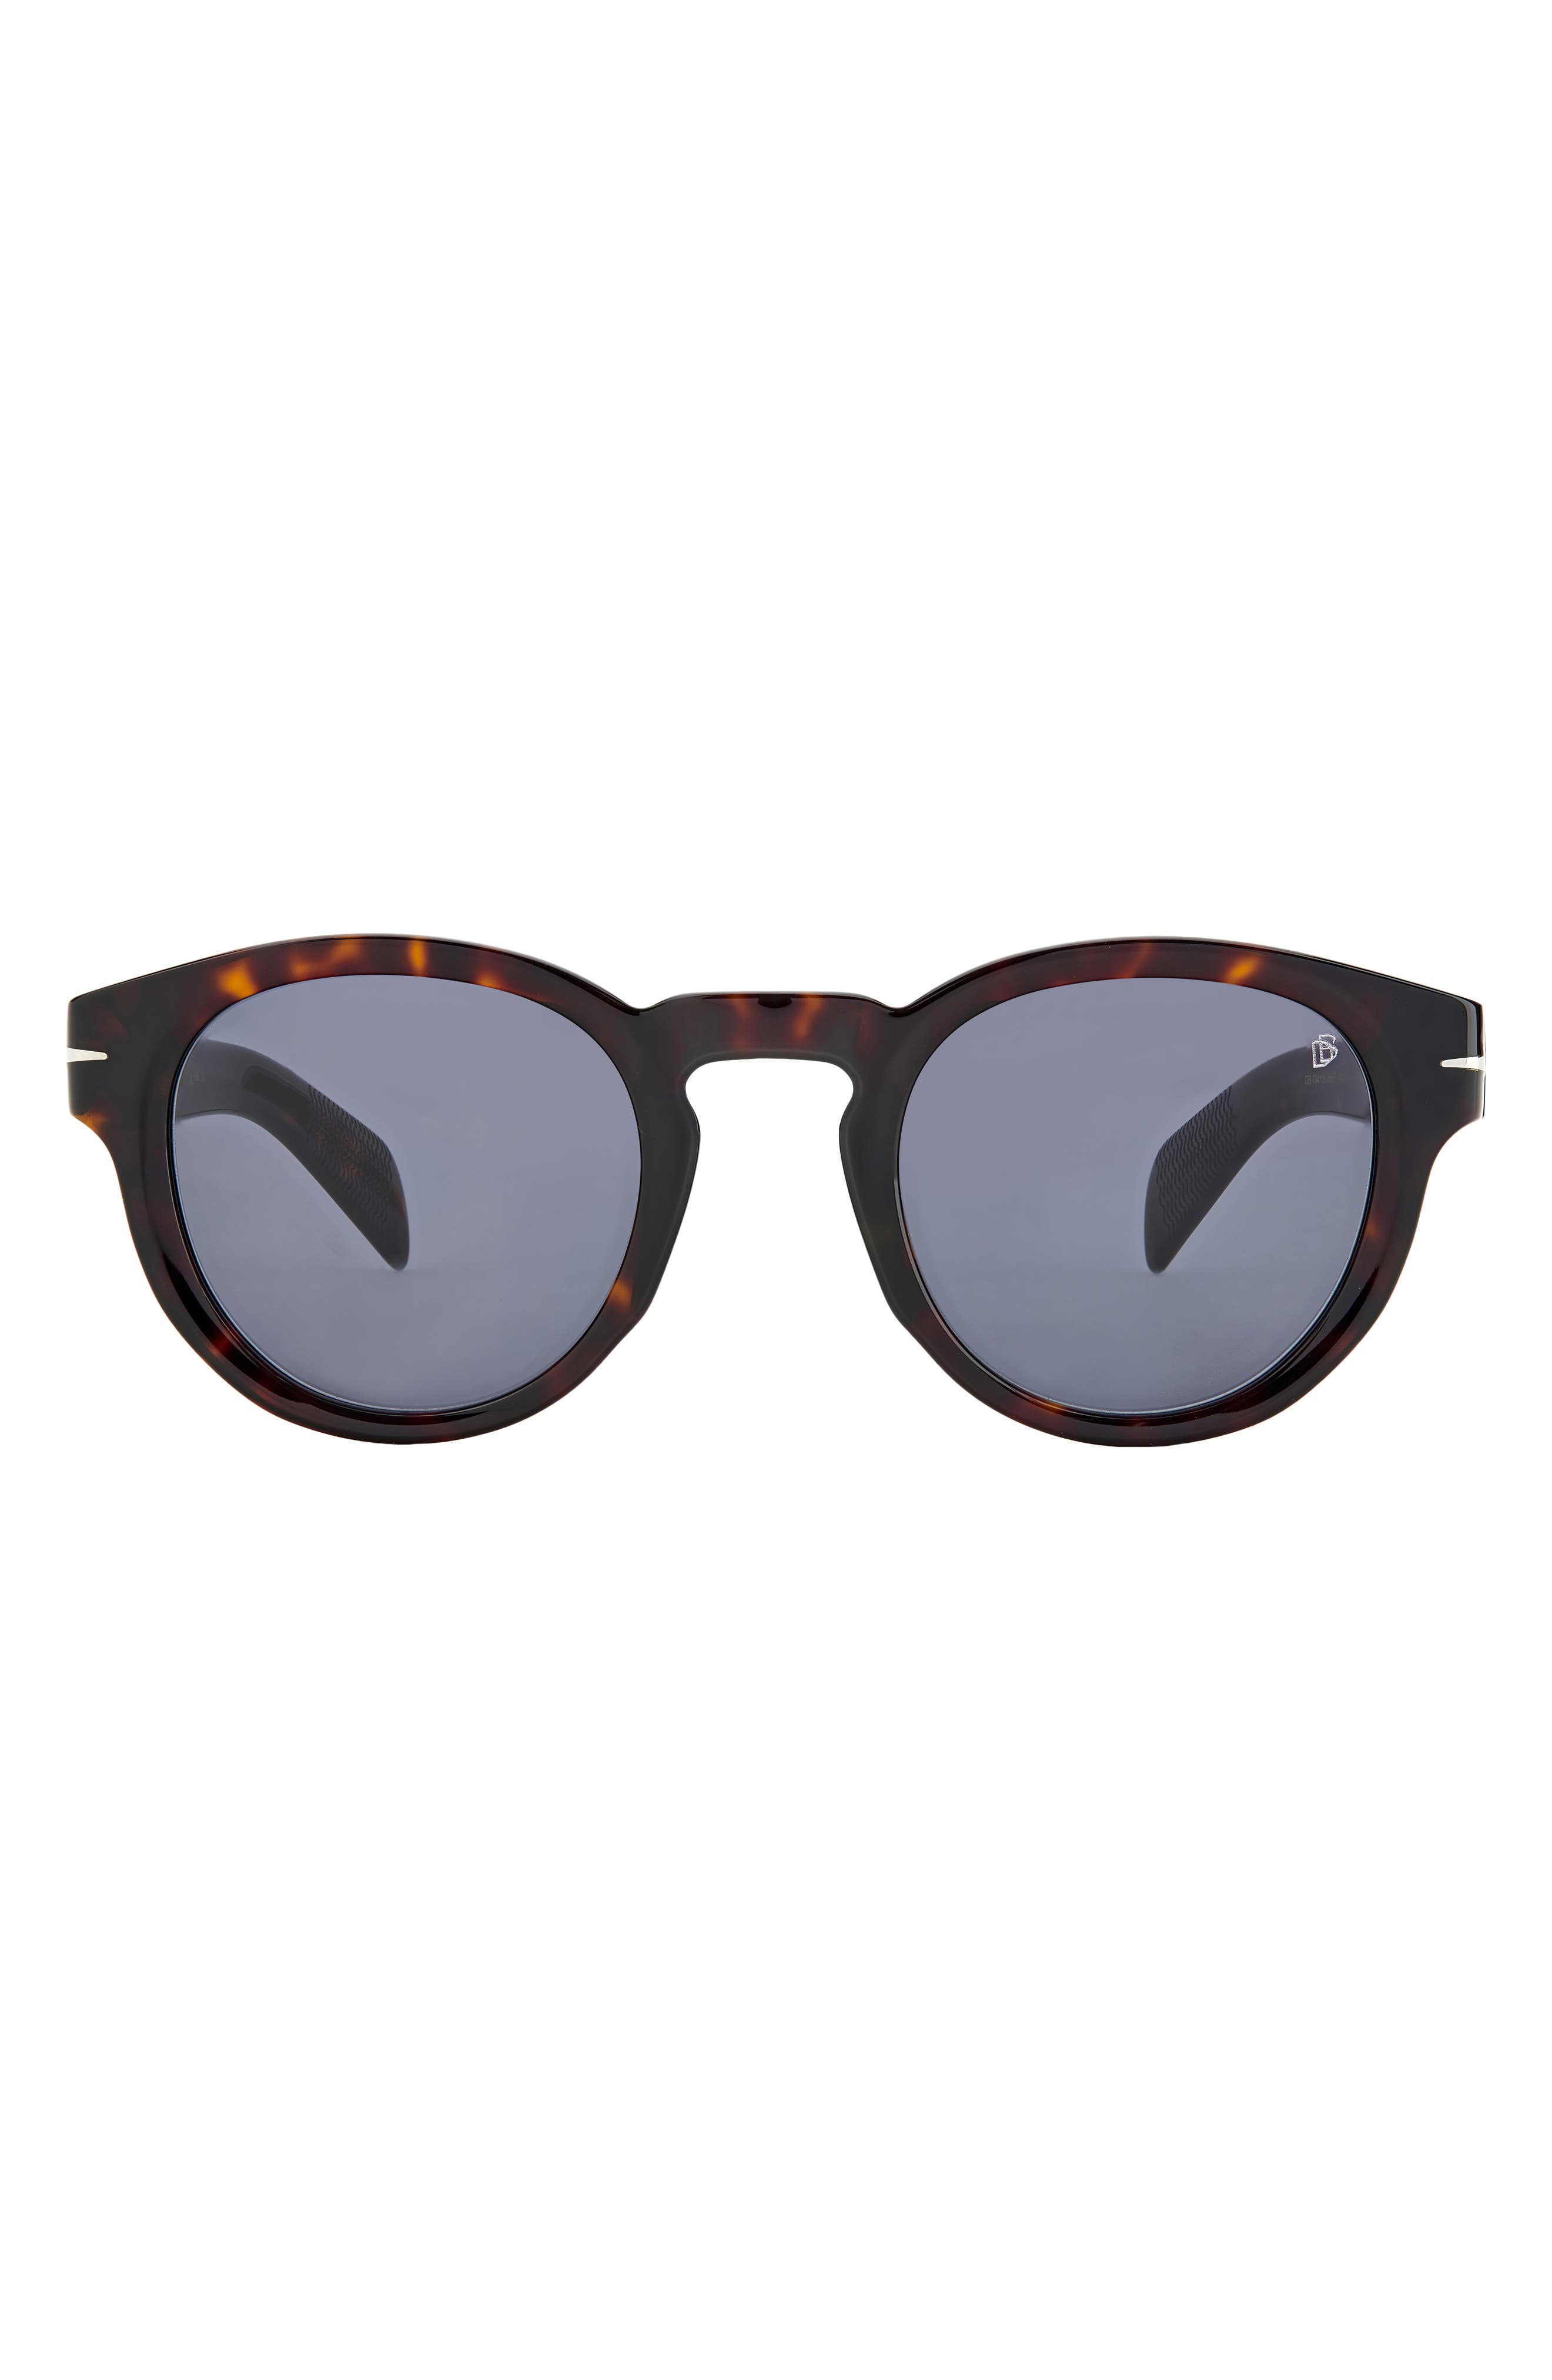 Men's David Beckham 48mm Round Sunglasses